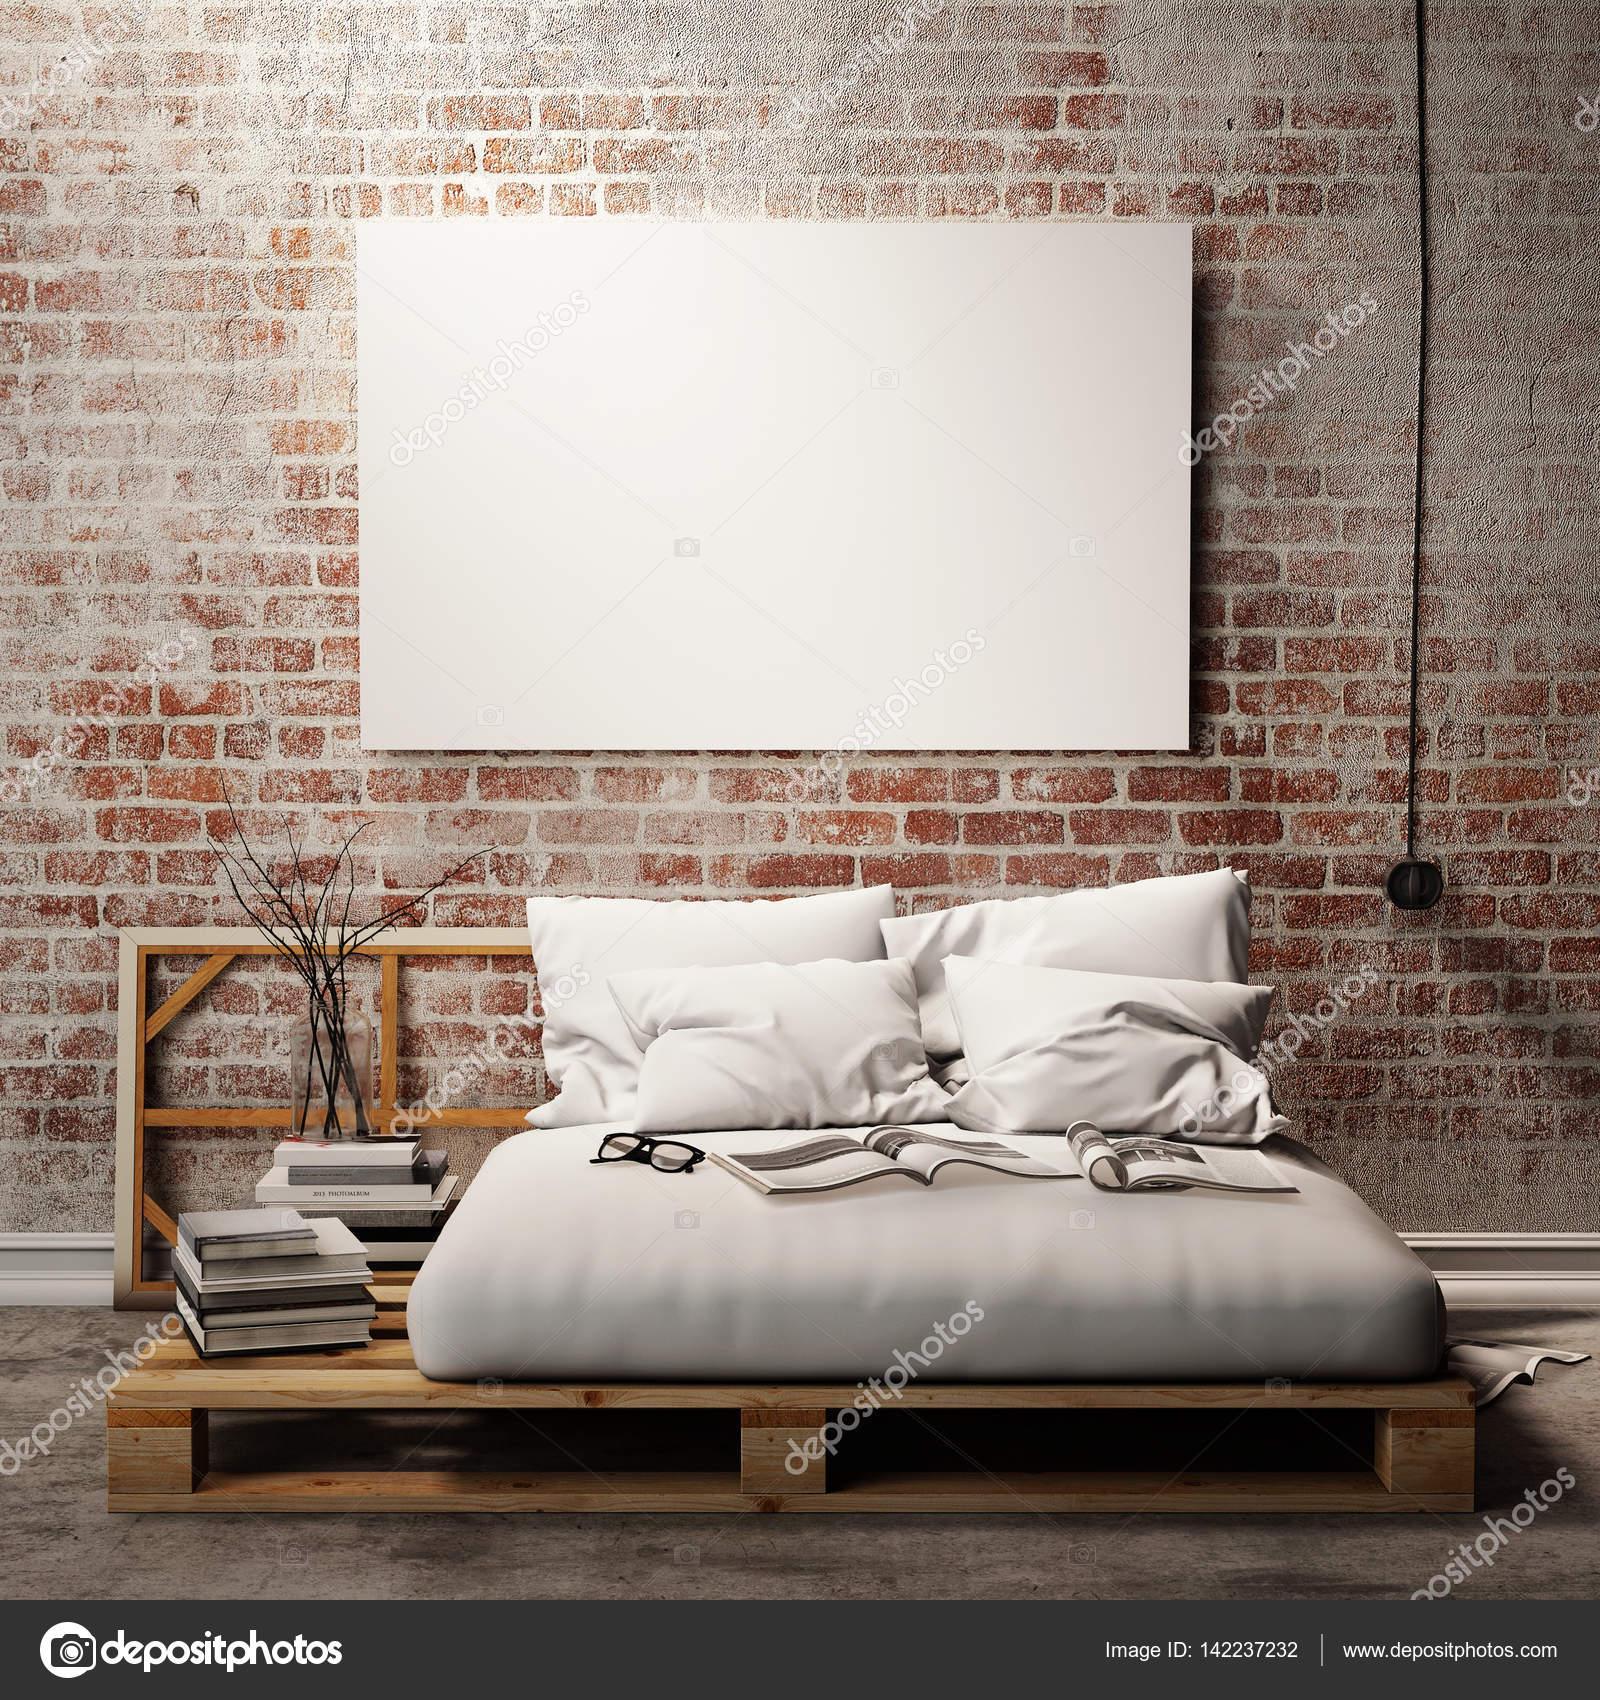 Mock Up Leer Poster An Der Wand Der Schlafzimmer, 3d Illustration  Hintergrund, Rendering